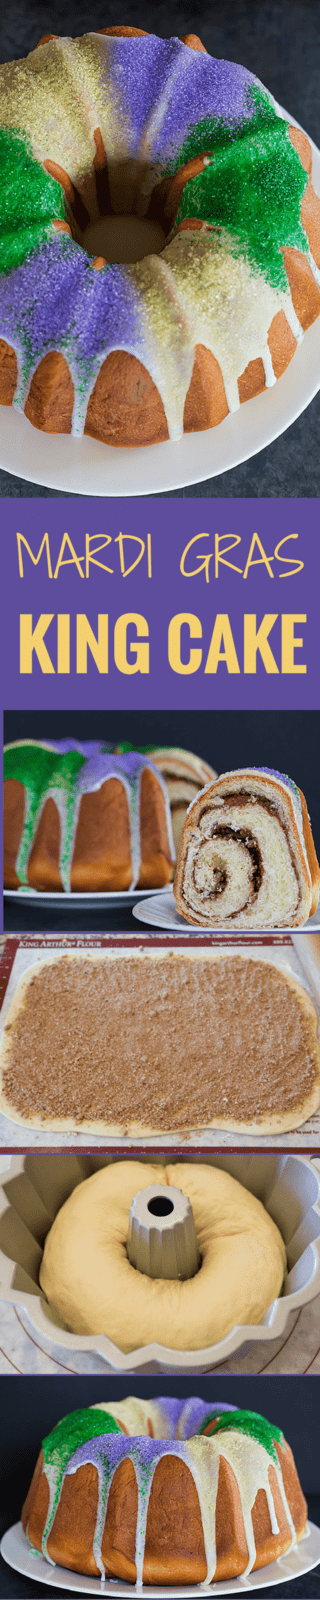 http://www.browneyedbaker.com/king-bundt-cake/